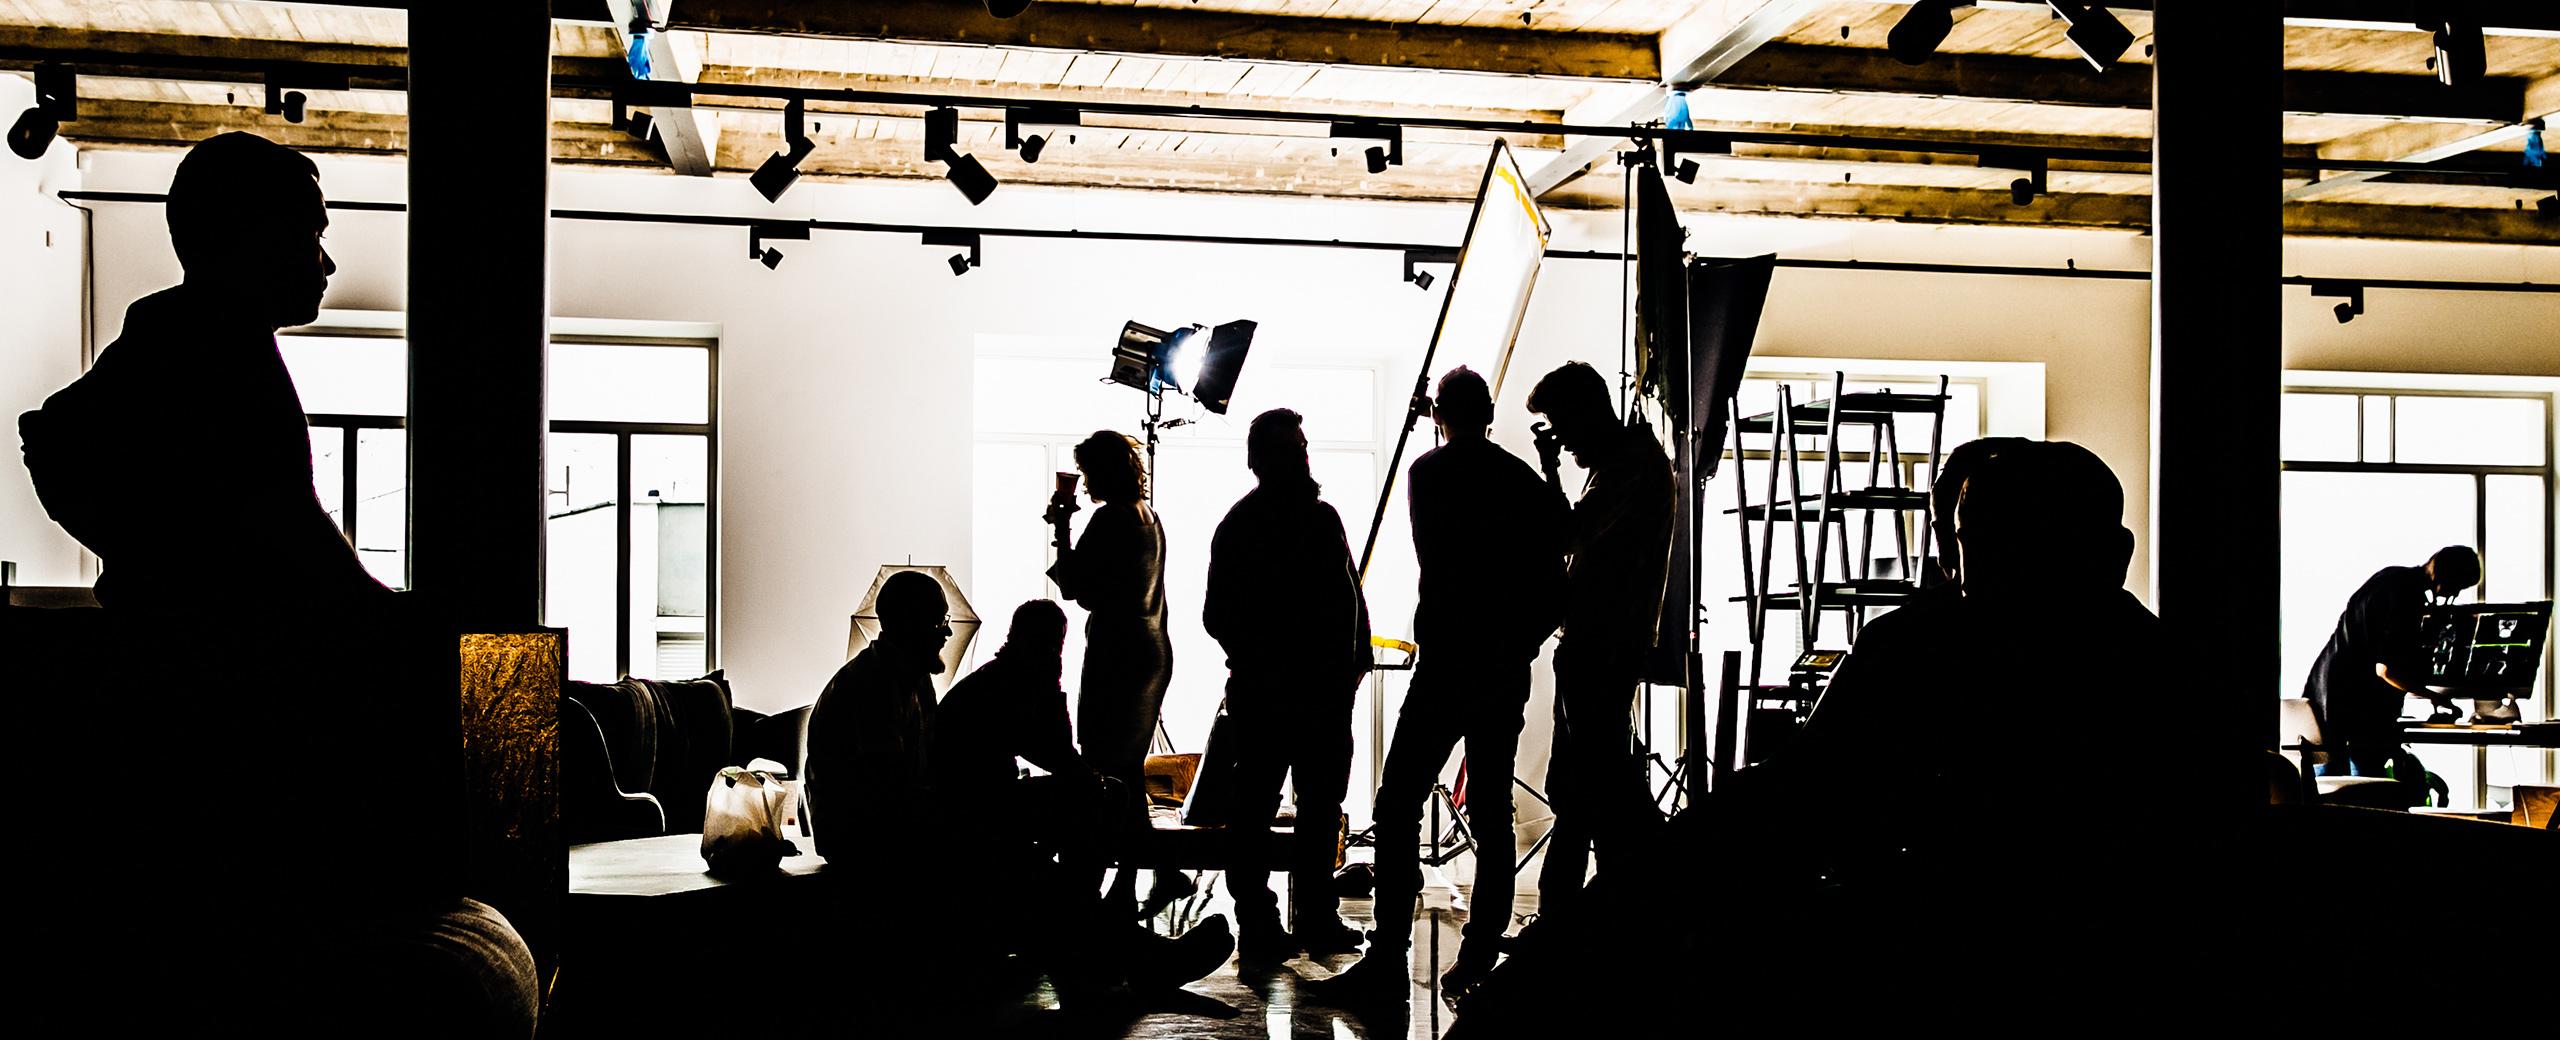 Foto Shooting Szenario bei Blossom Management GmbH